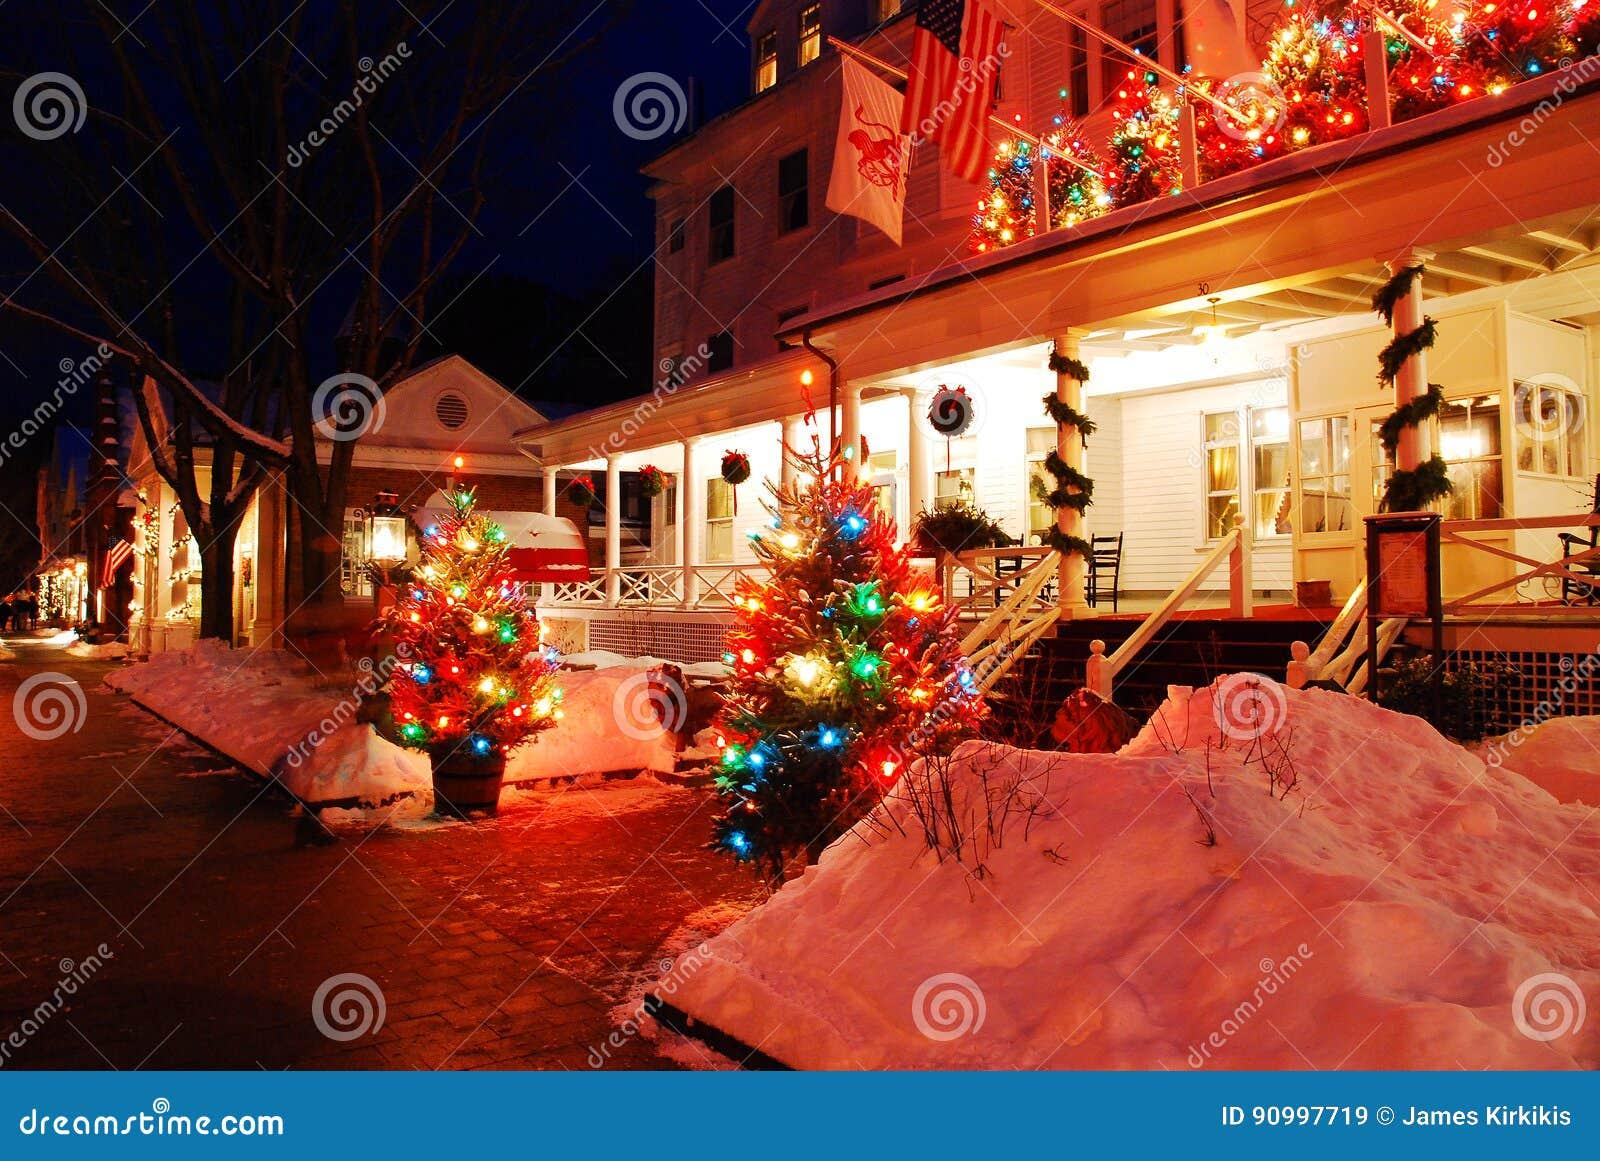 The Christmas Inn.Christmas At The Inn Editorial Stock Image Image Of